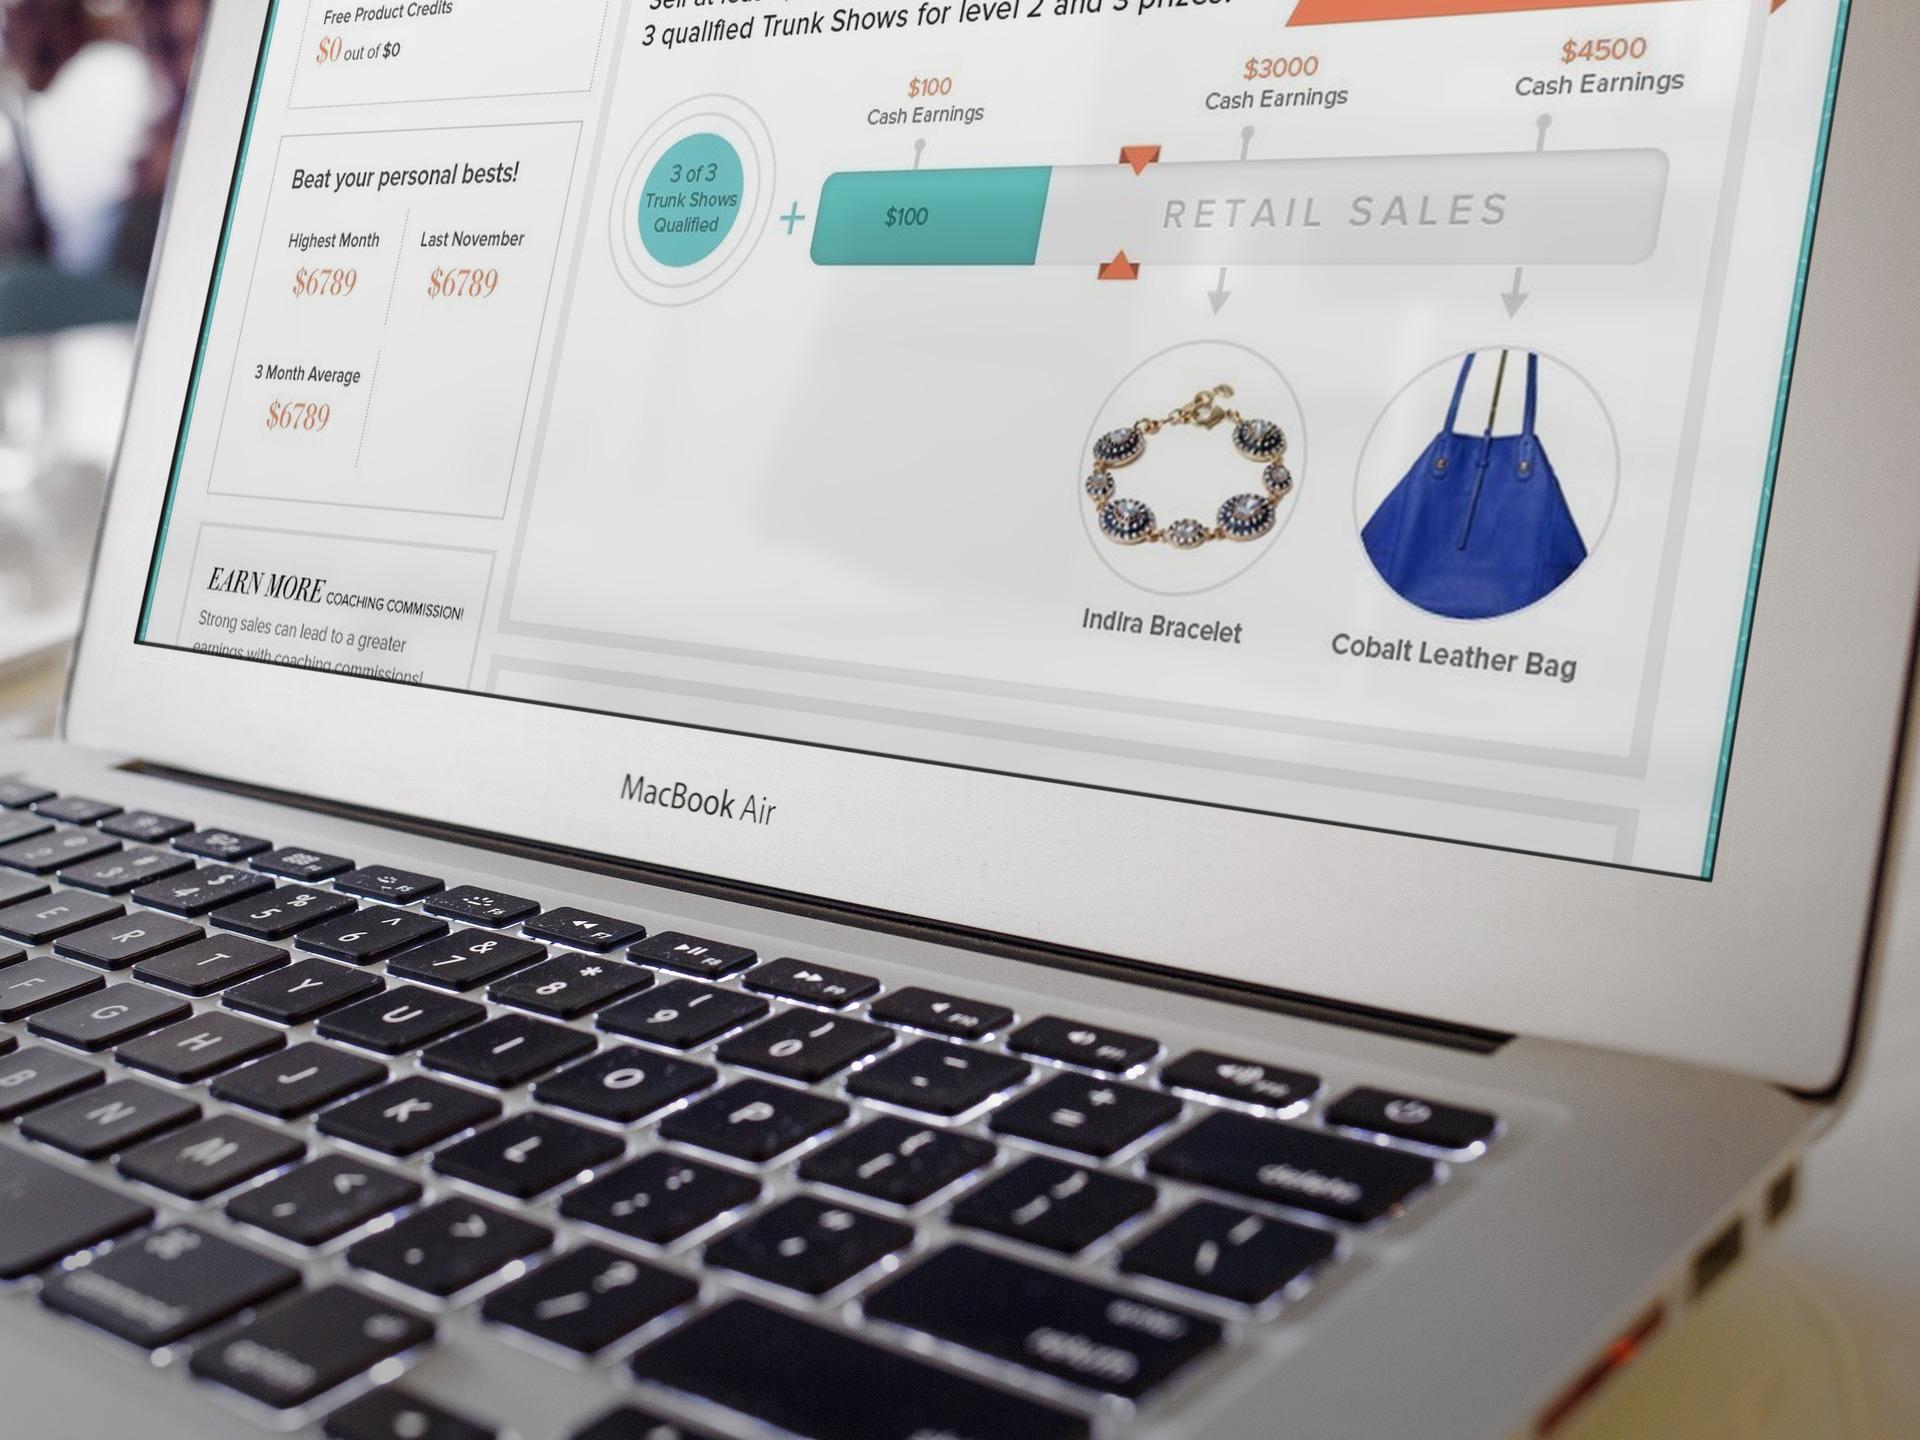 Stella & Dot User Dashboard - Detail